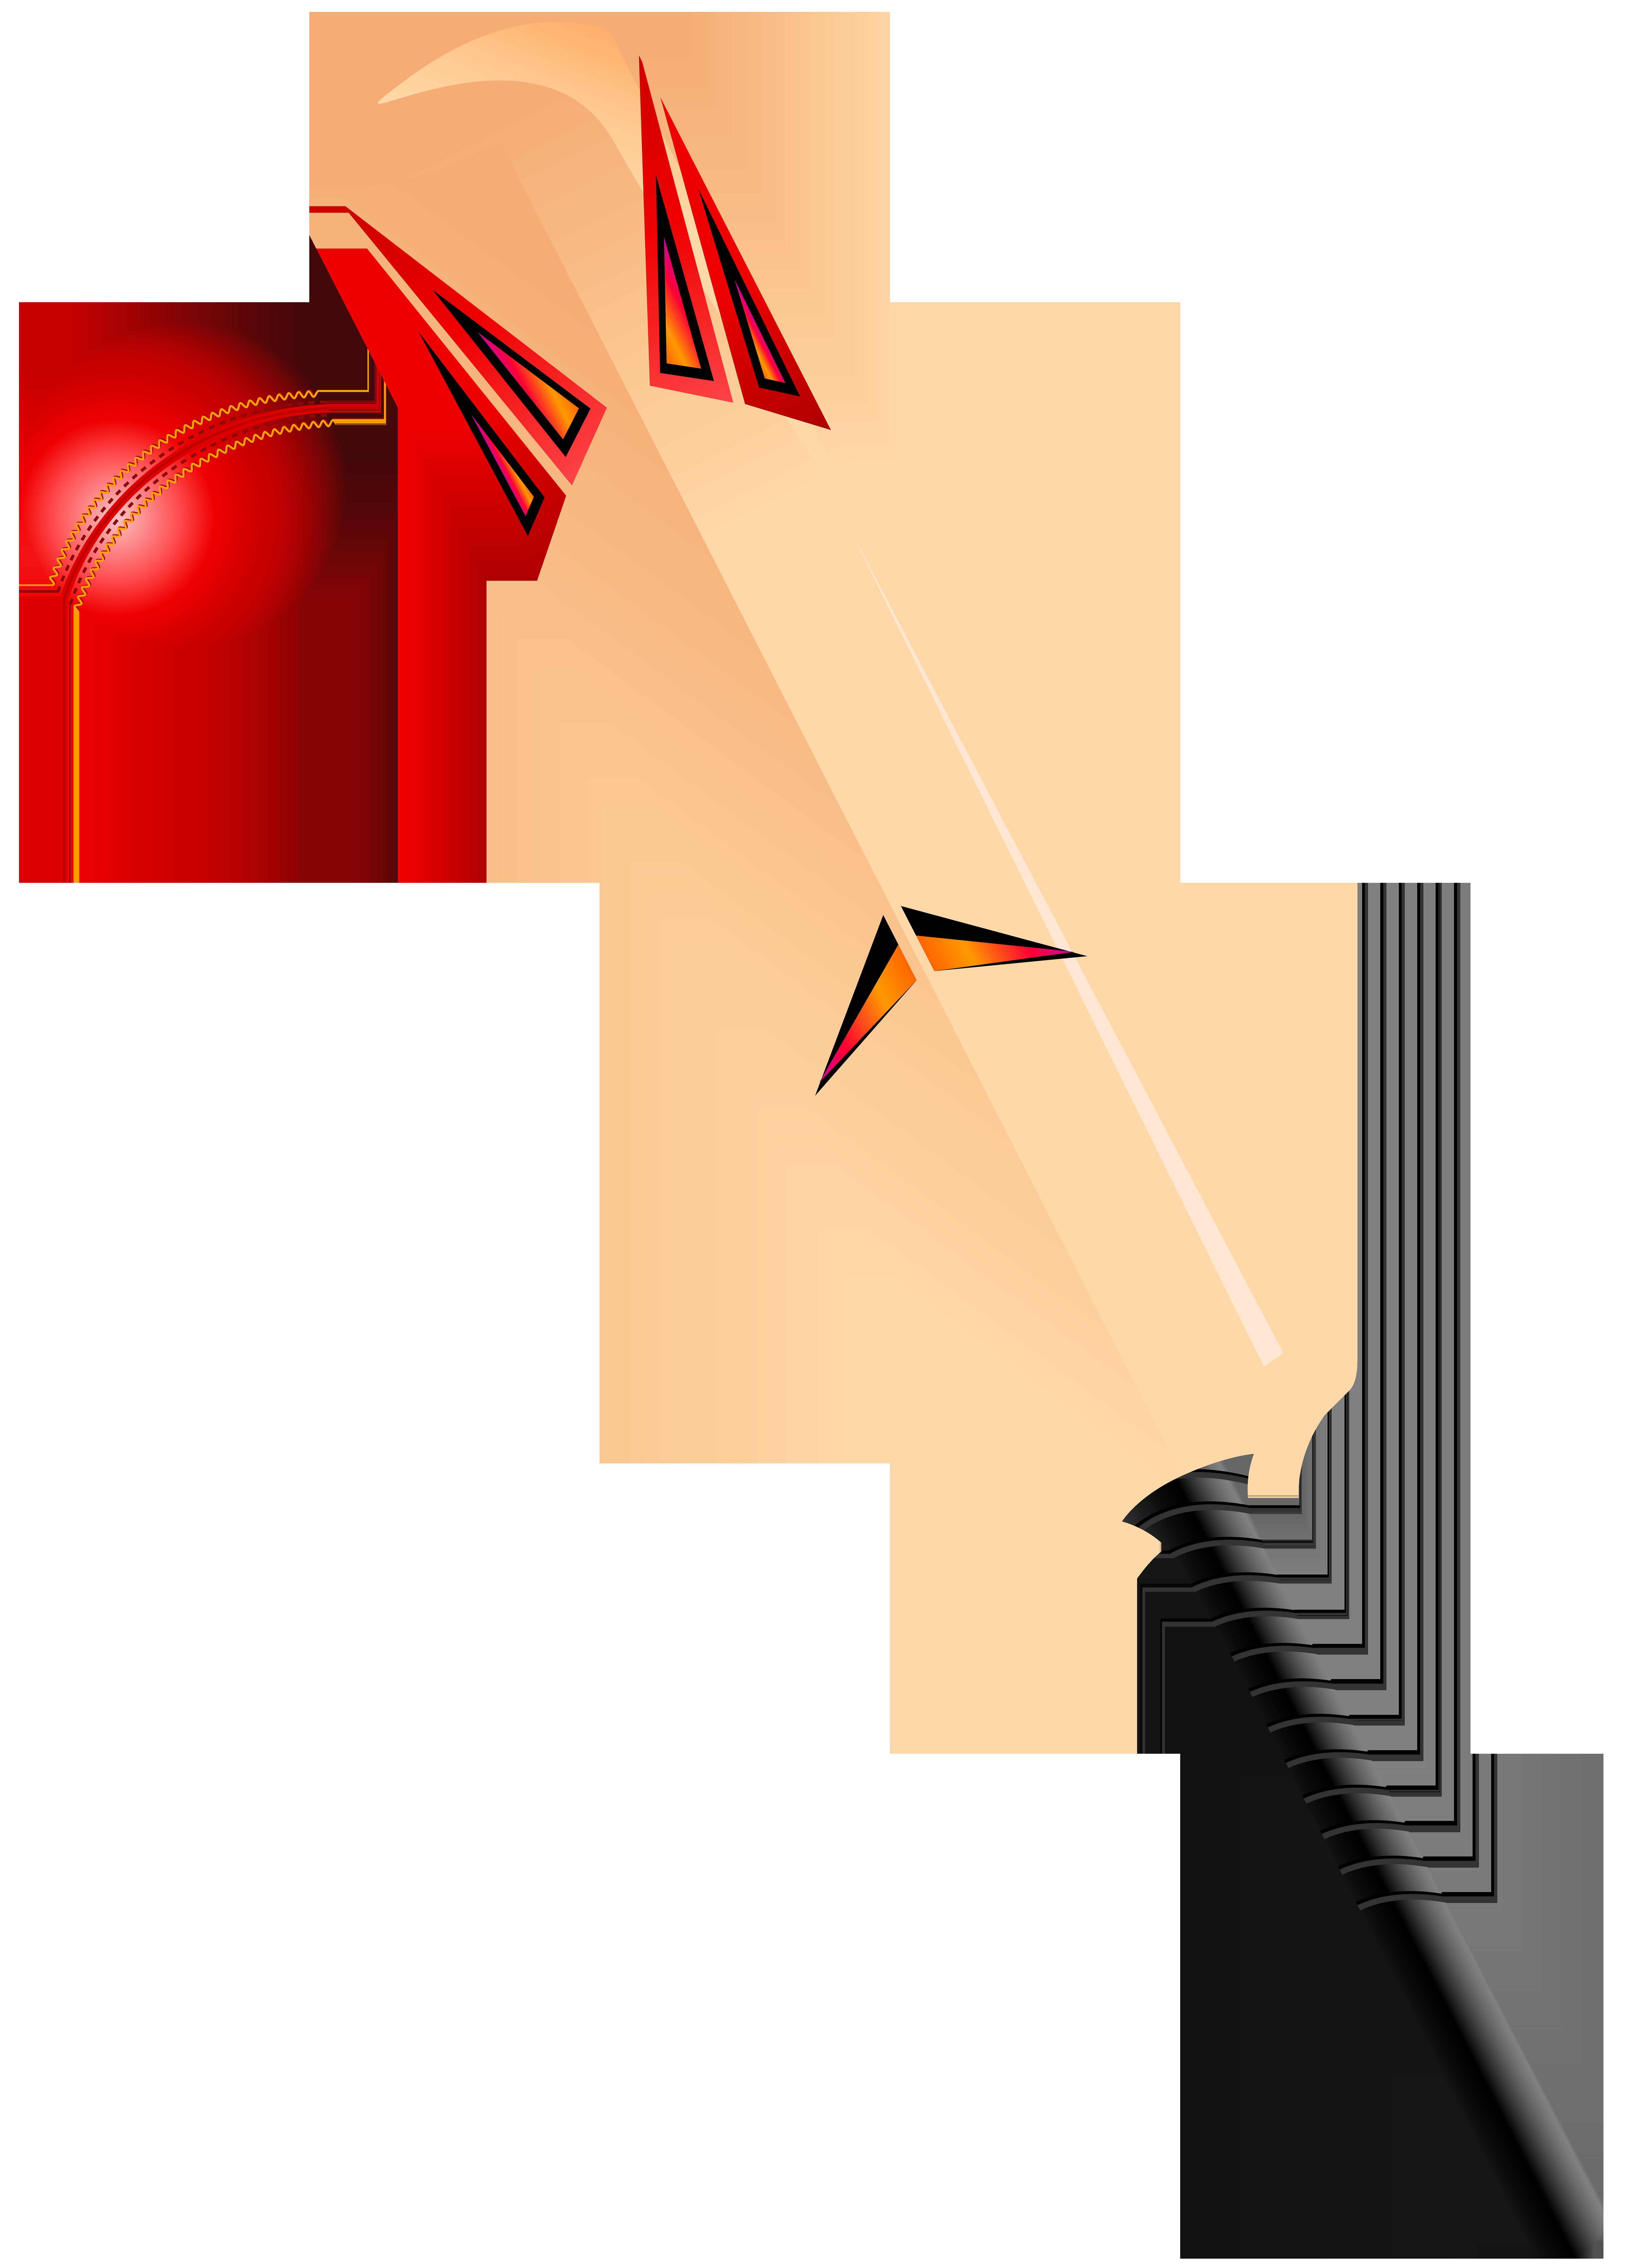 Clipart beach cricket. Png clip art image